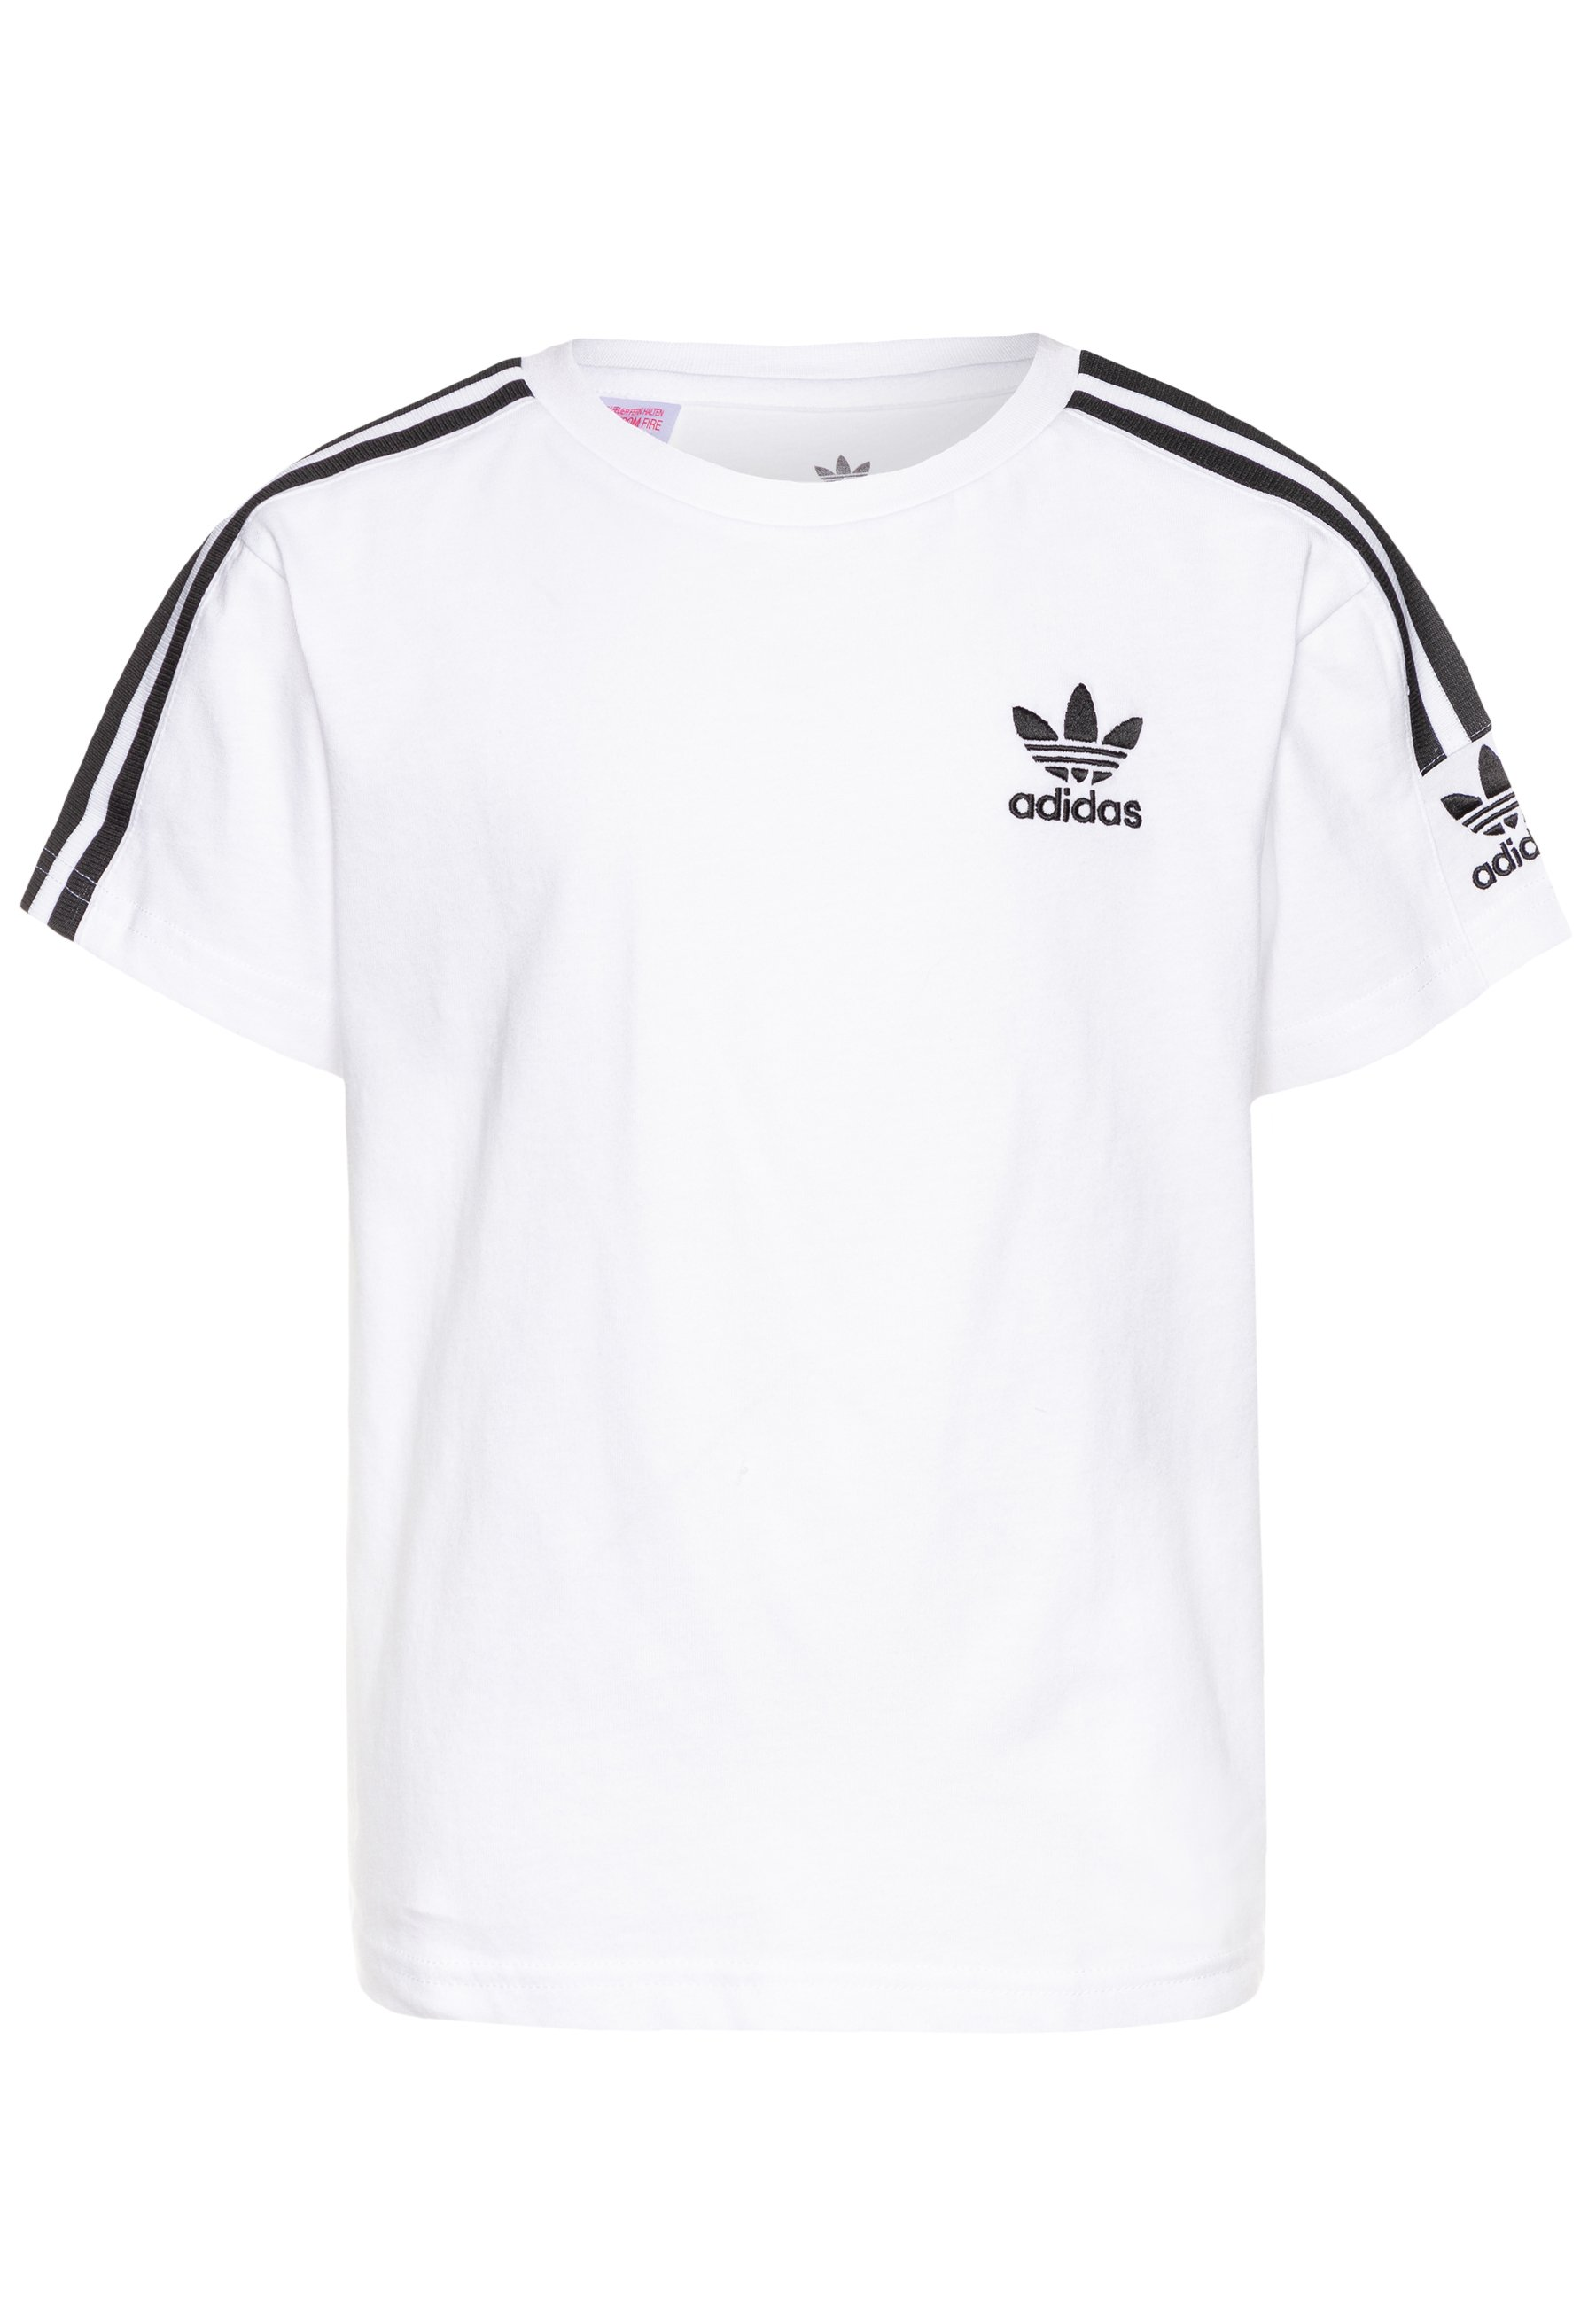 adidas Originals LOCK UP TEE T Shirts SOFVIS